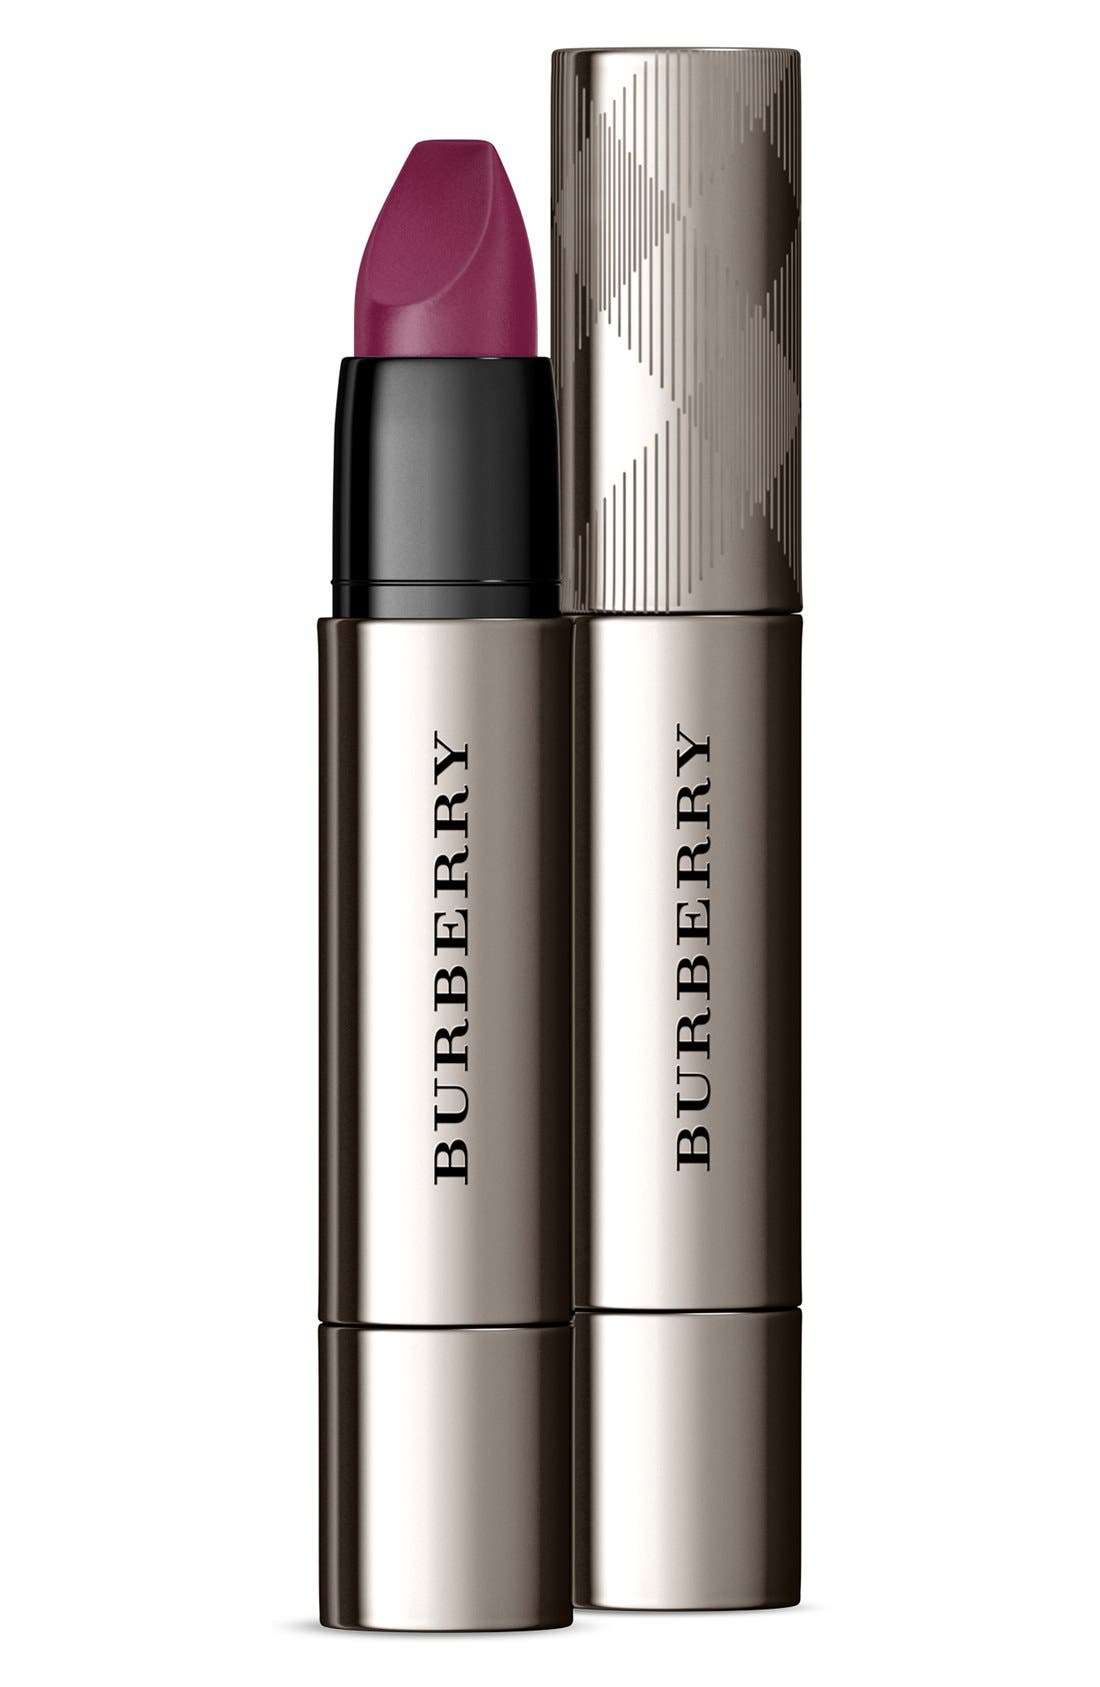 Burberry Beauty Full Kisses Lipstick